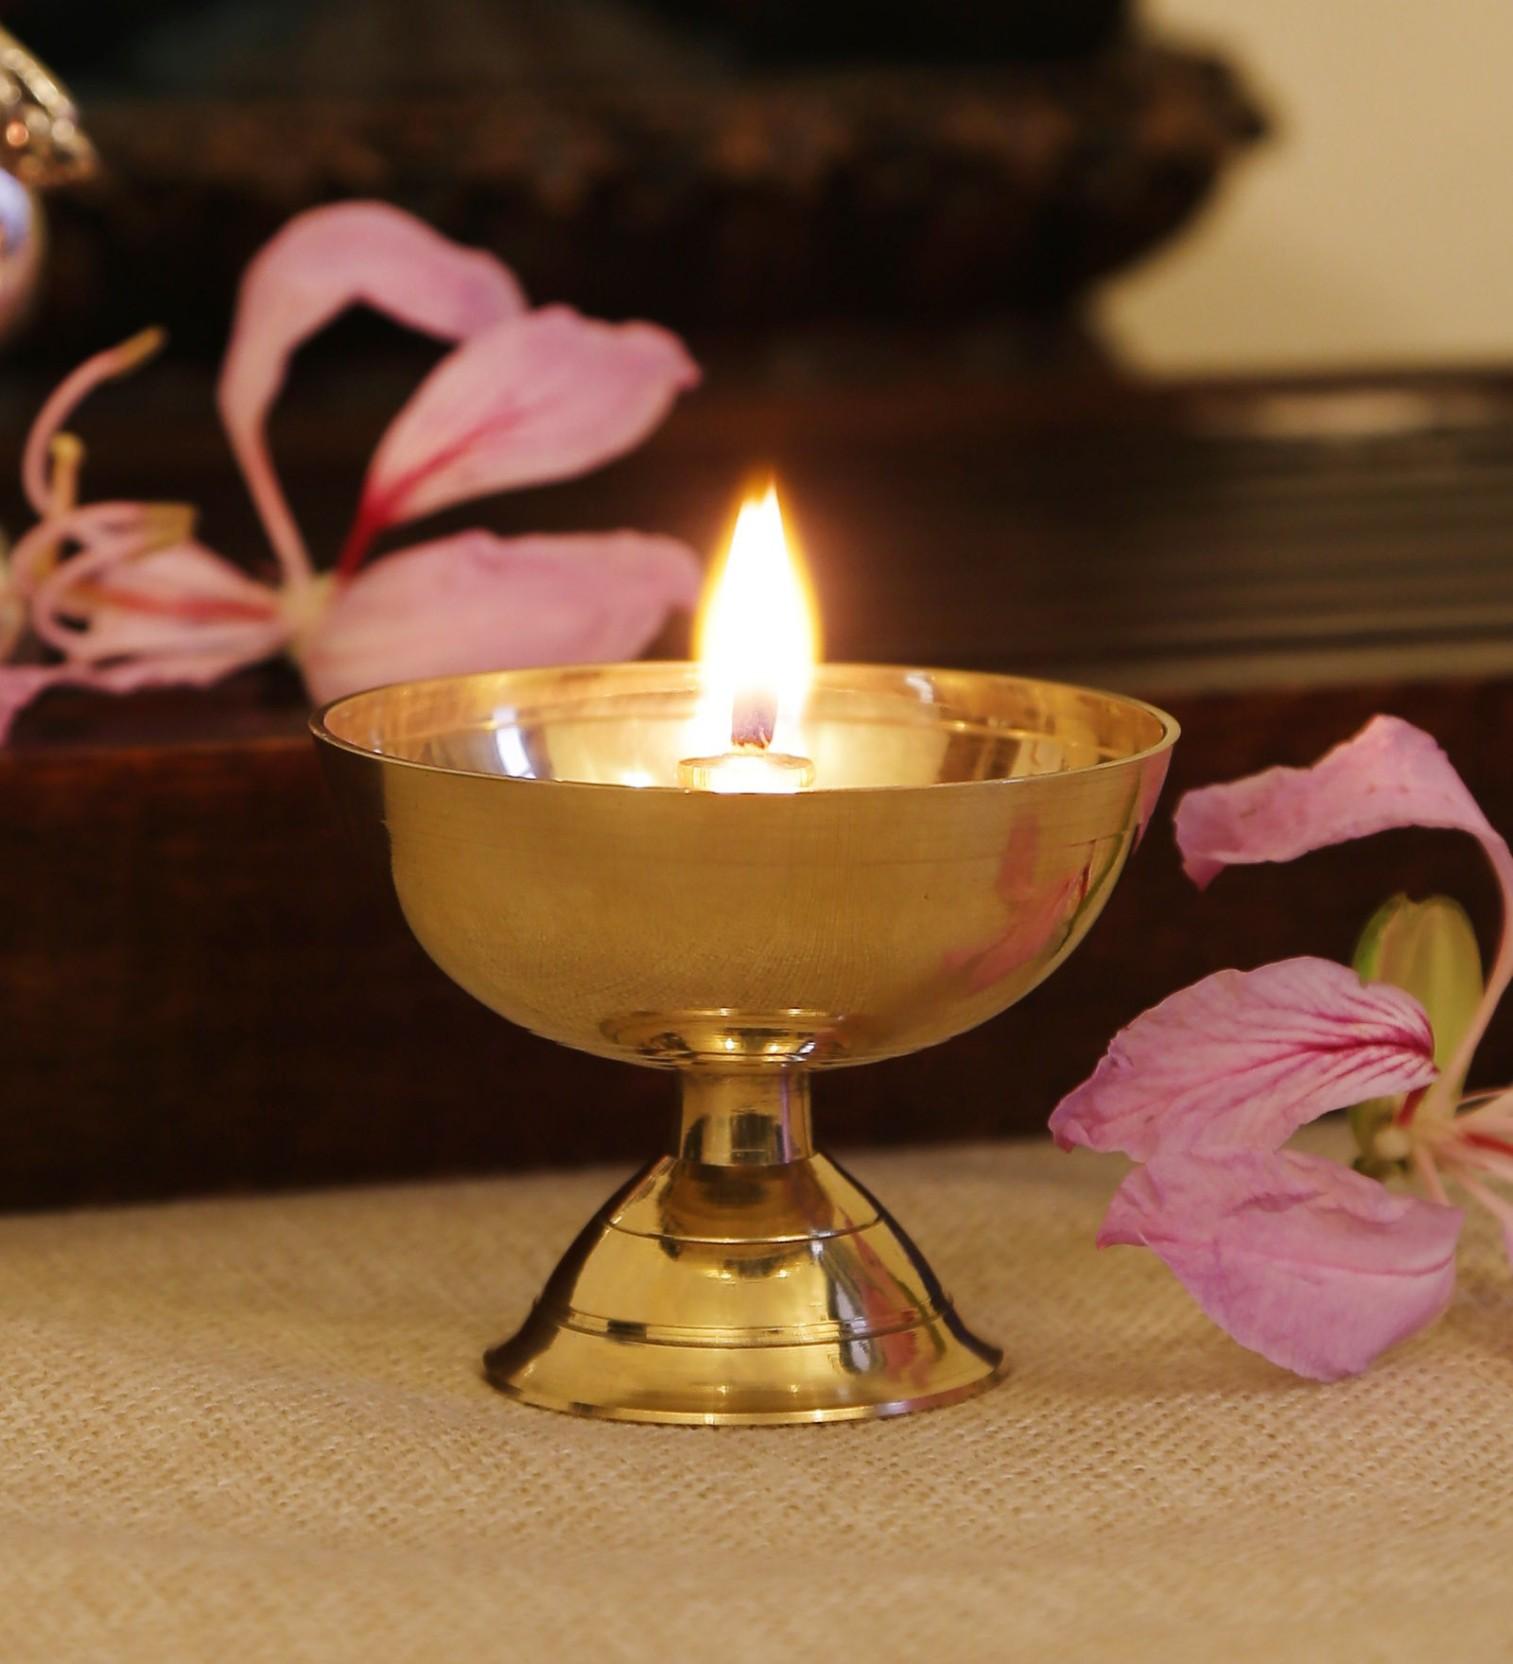 PunjabKesari, Dharam, Ankhad jyoti, Navratri, अखंड ज्योति, Navratri 2019, शारदीय नवरात्रि, नवरात्रि 2019, shardiya navratri 2019, Maa Durga, Punjab kesari, hindu religion, hindu shastra, navratri pujan, Navratri dates